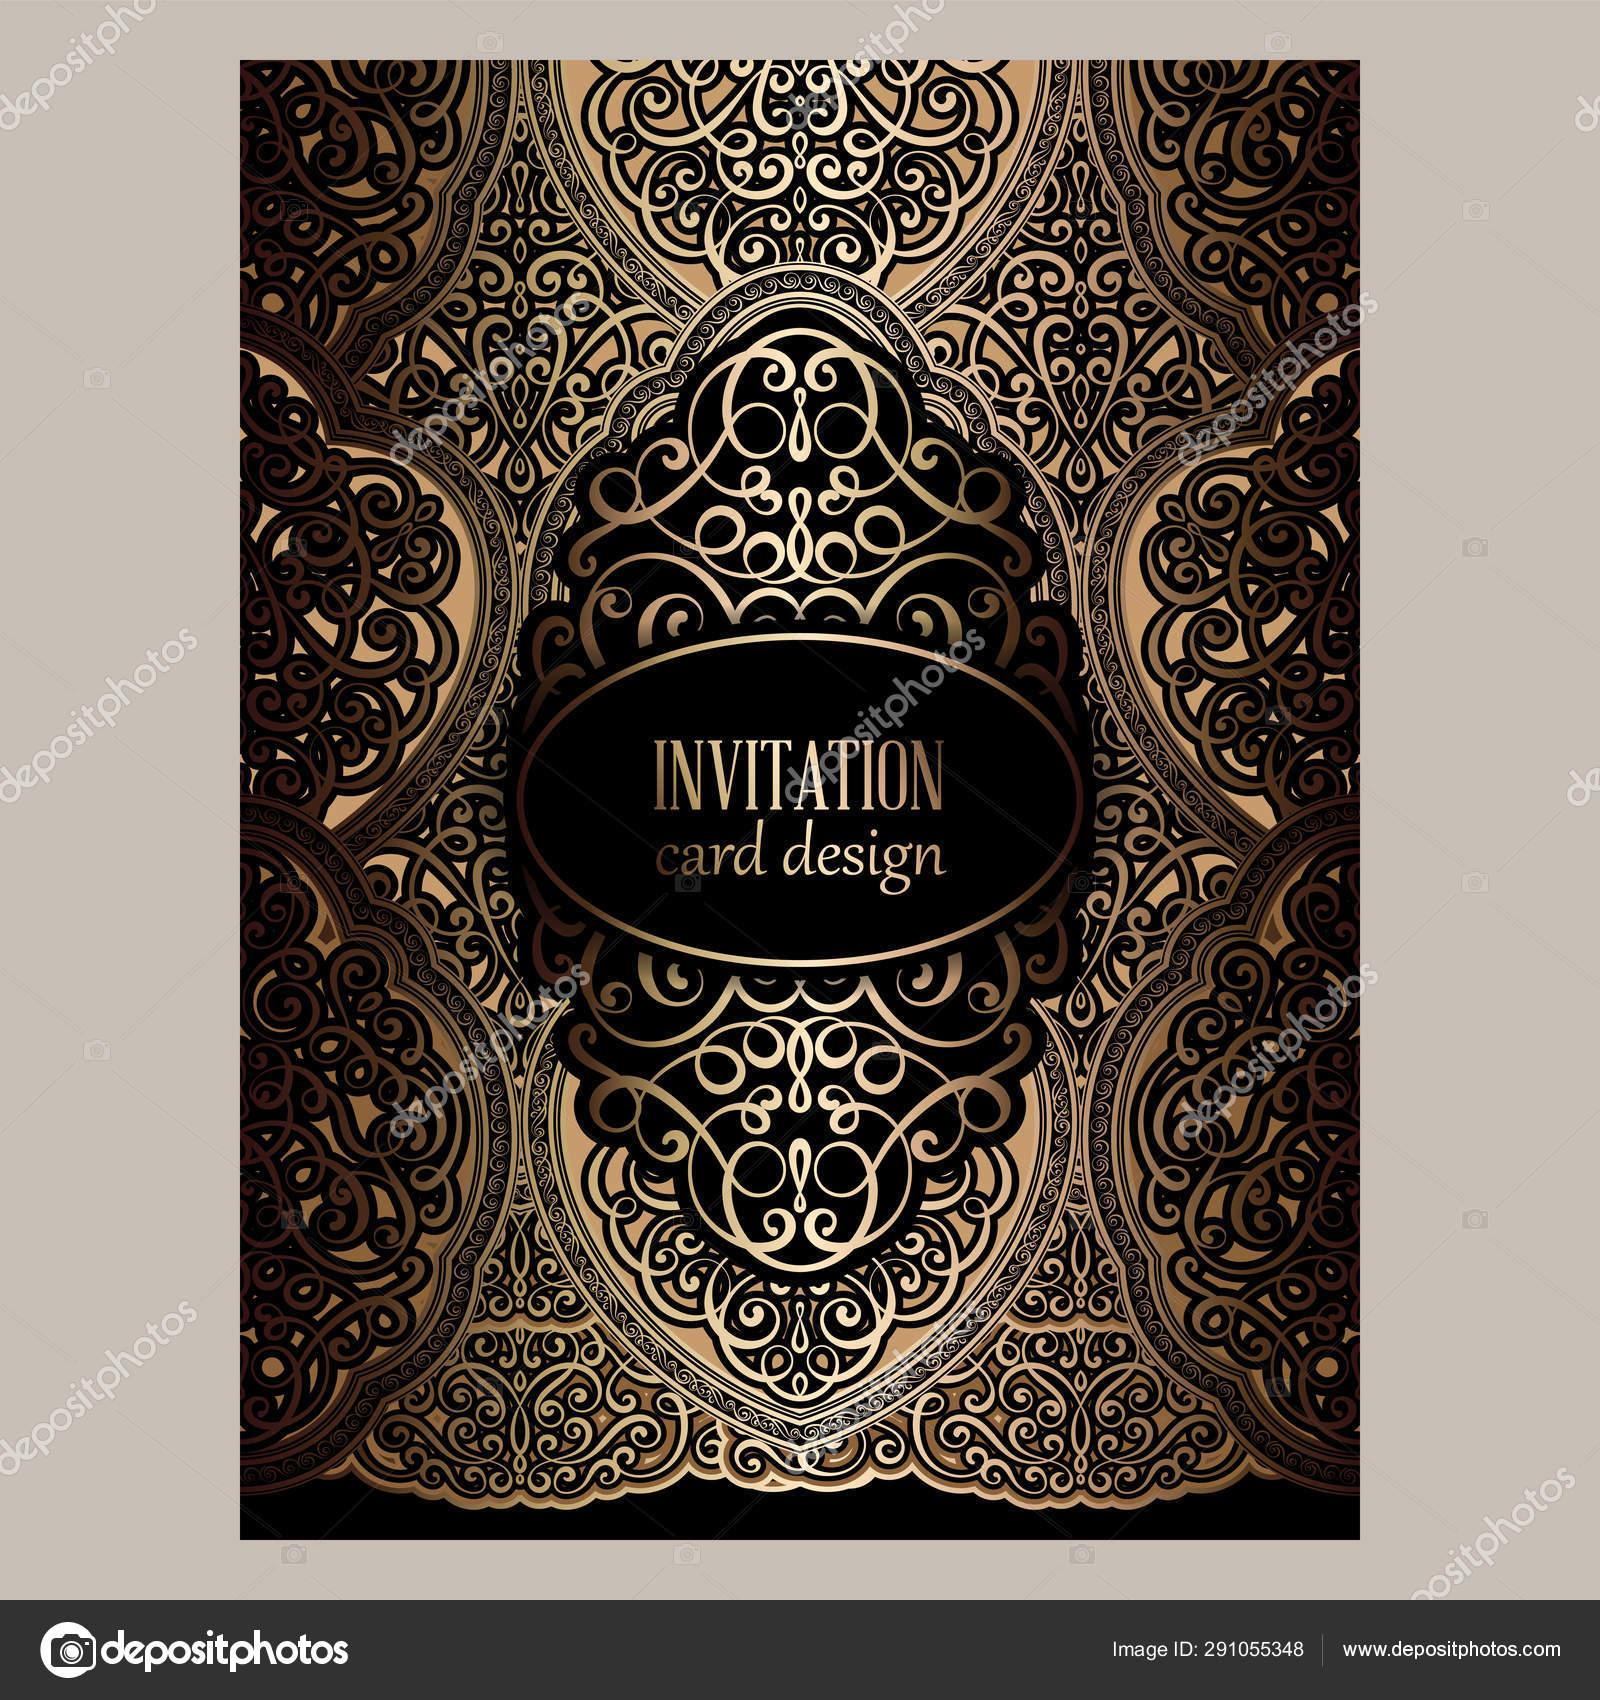 https depositphotos com 291055348 stock illustration wedding invitation card with black html